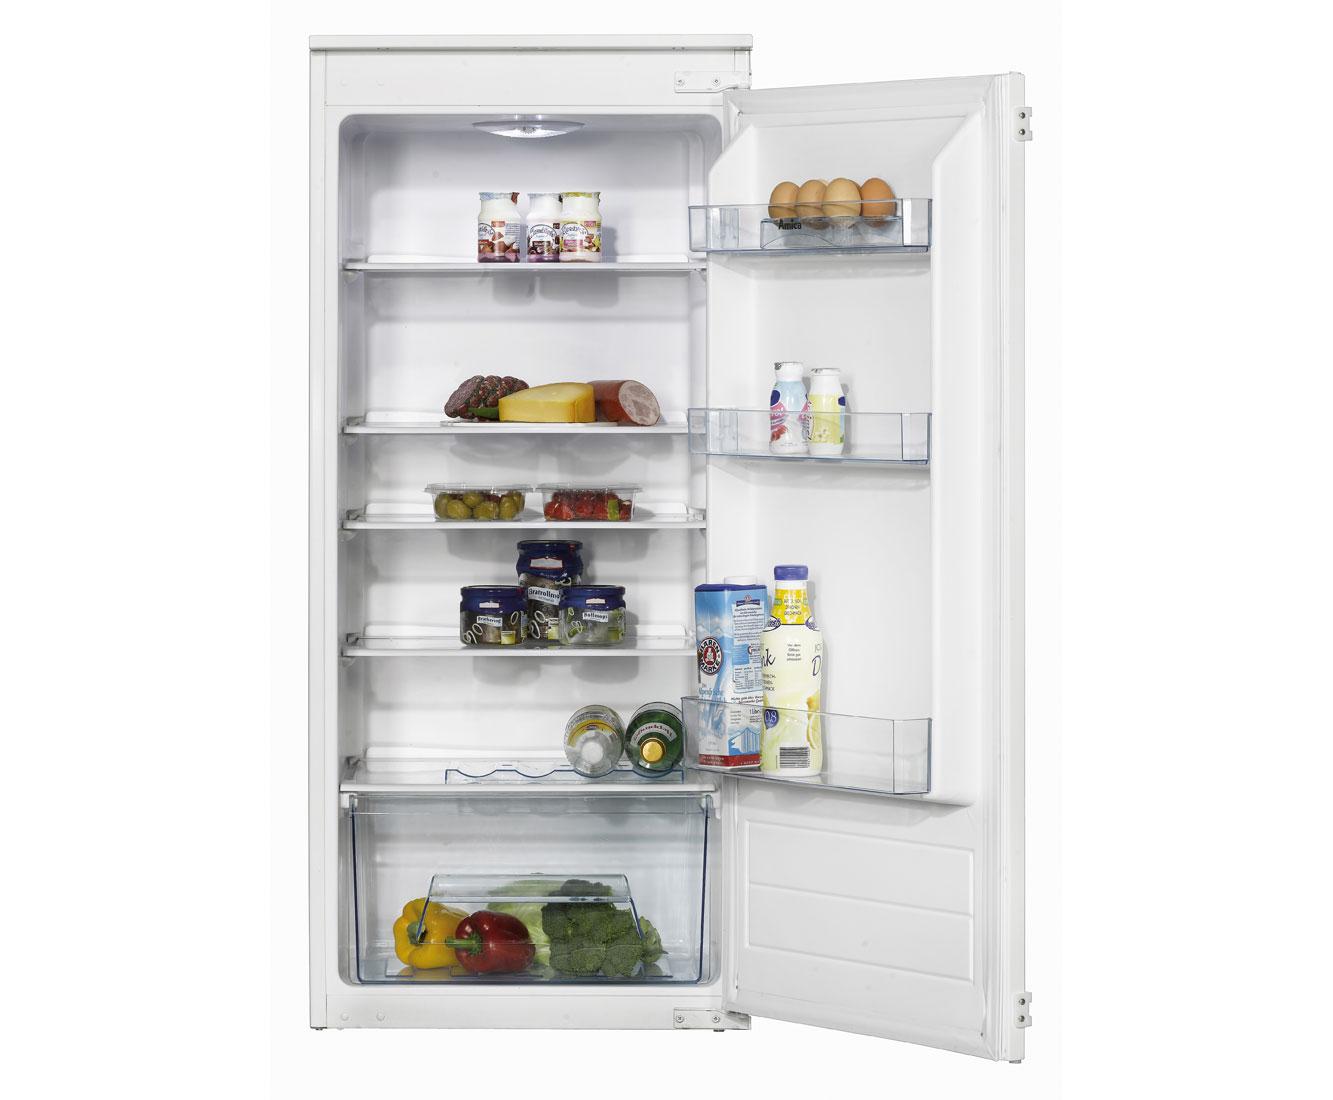 Bosch Kühlschrank Nass : Siemens kühlschrank immer nass: wasser im kühlschrank unter dem